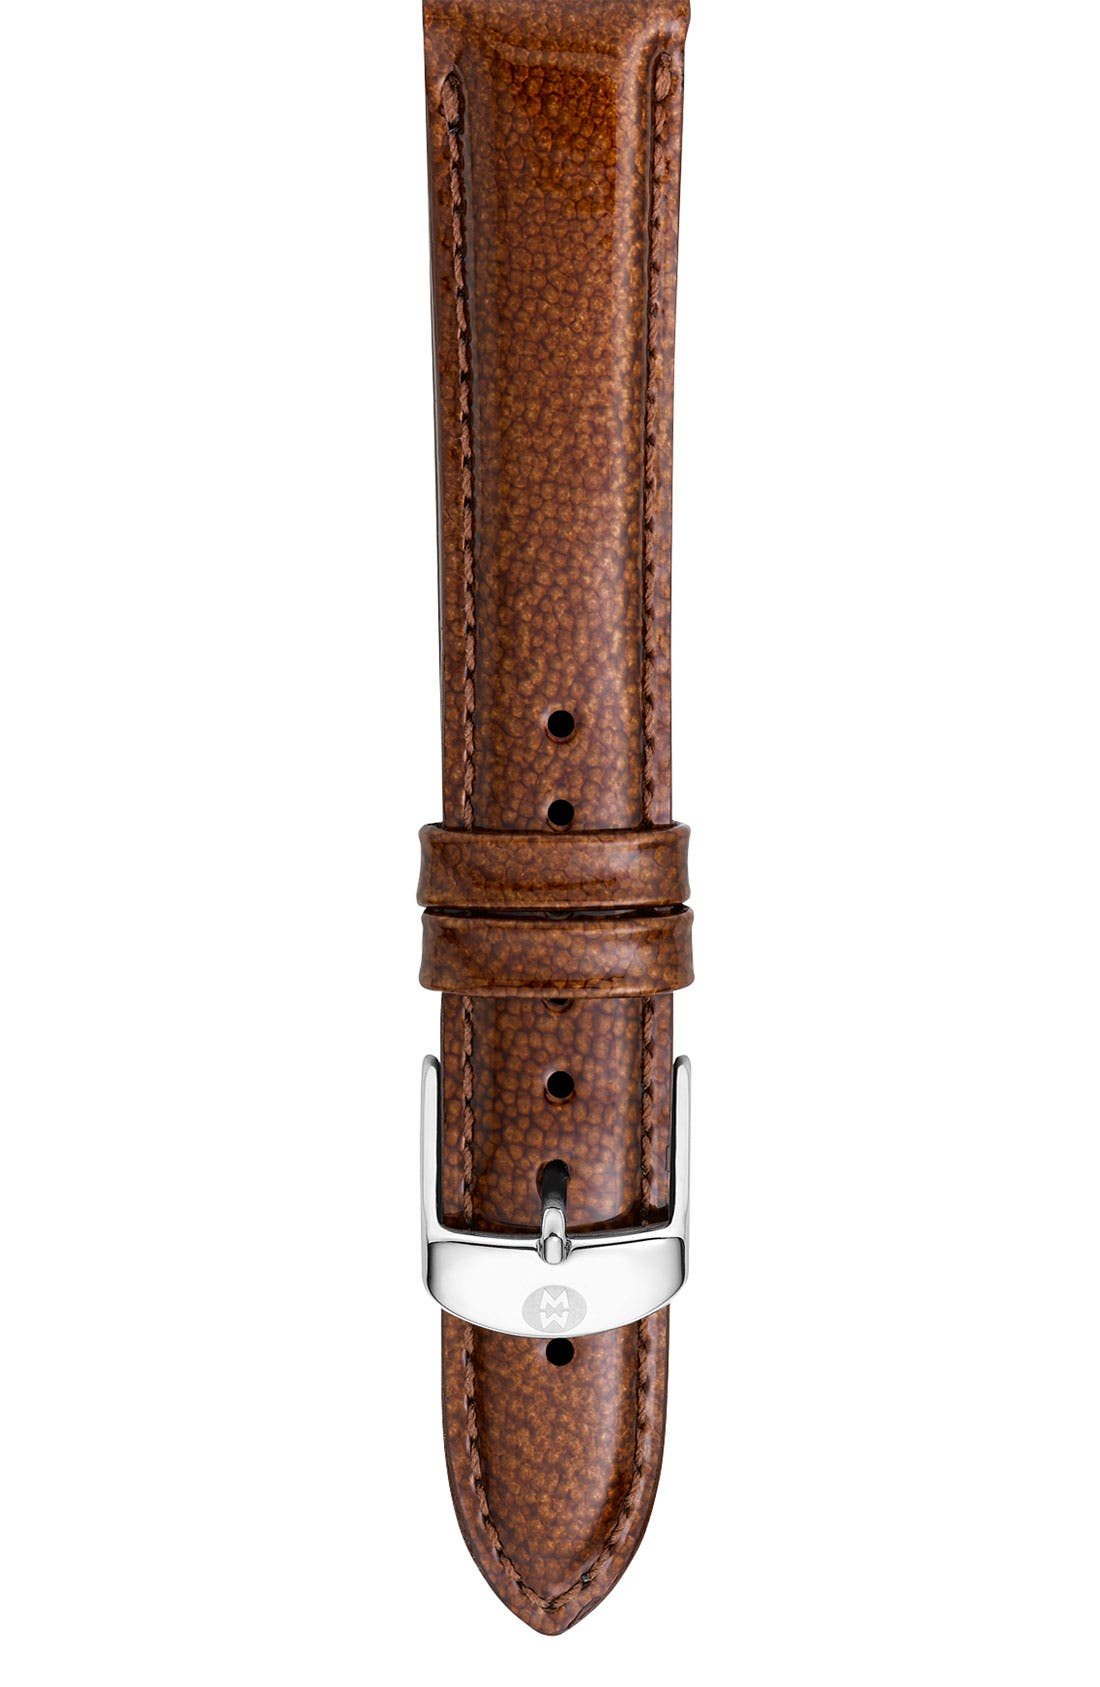 Alternate Image 1 Selected - MICHELE 'Deco Diamond' Diamond Dial Watch Case & 18mm Safari Patent Leather Strap